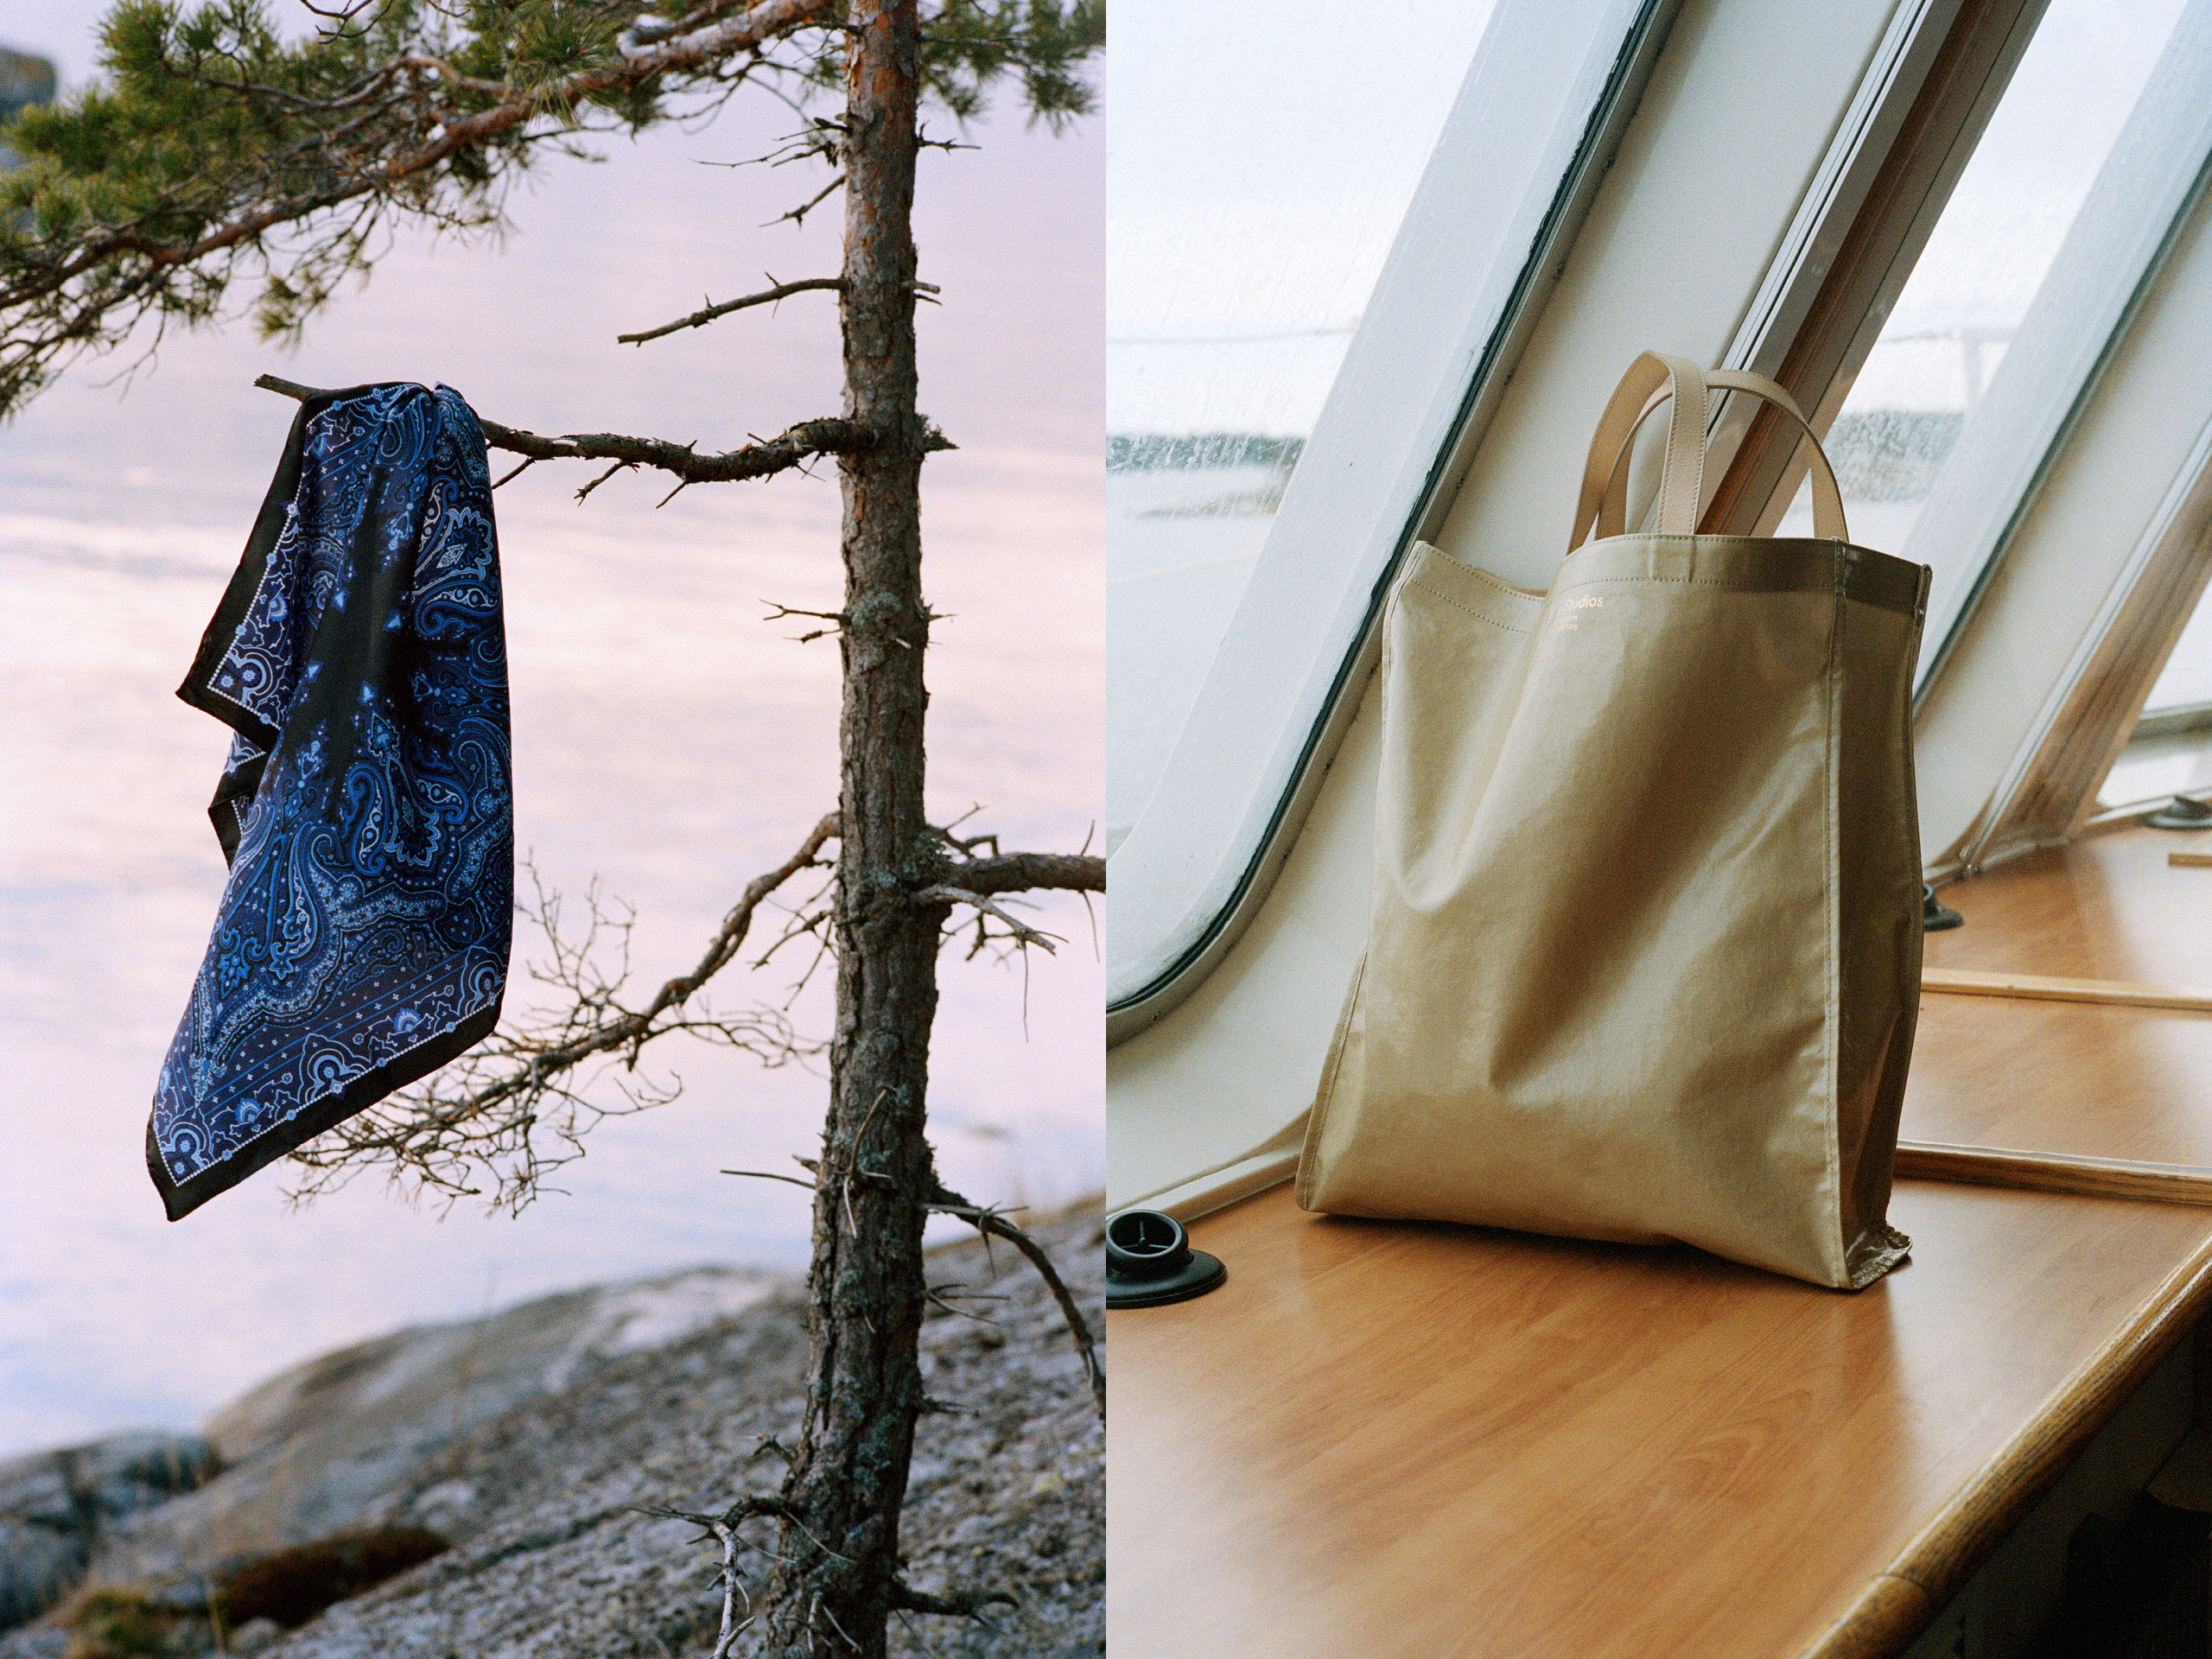 Woman Spring/Summer 2021 bandanas & bags